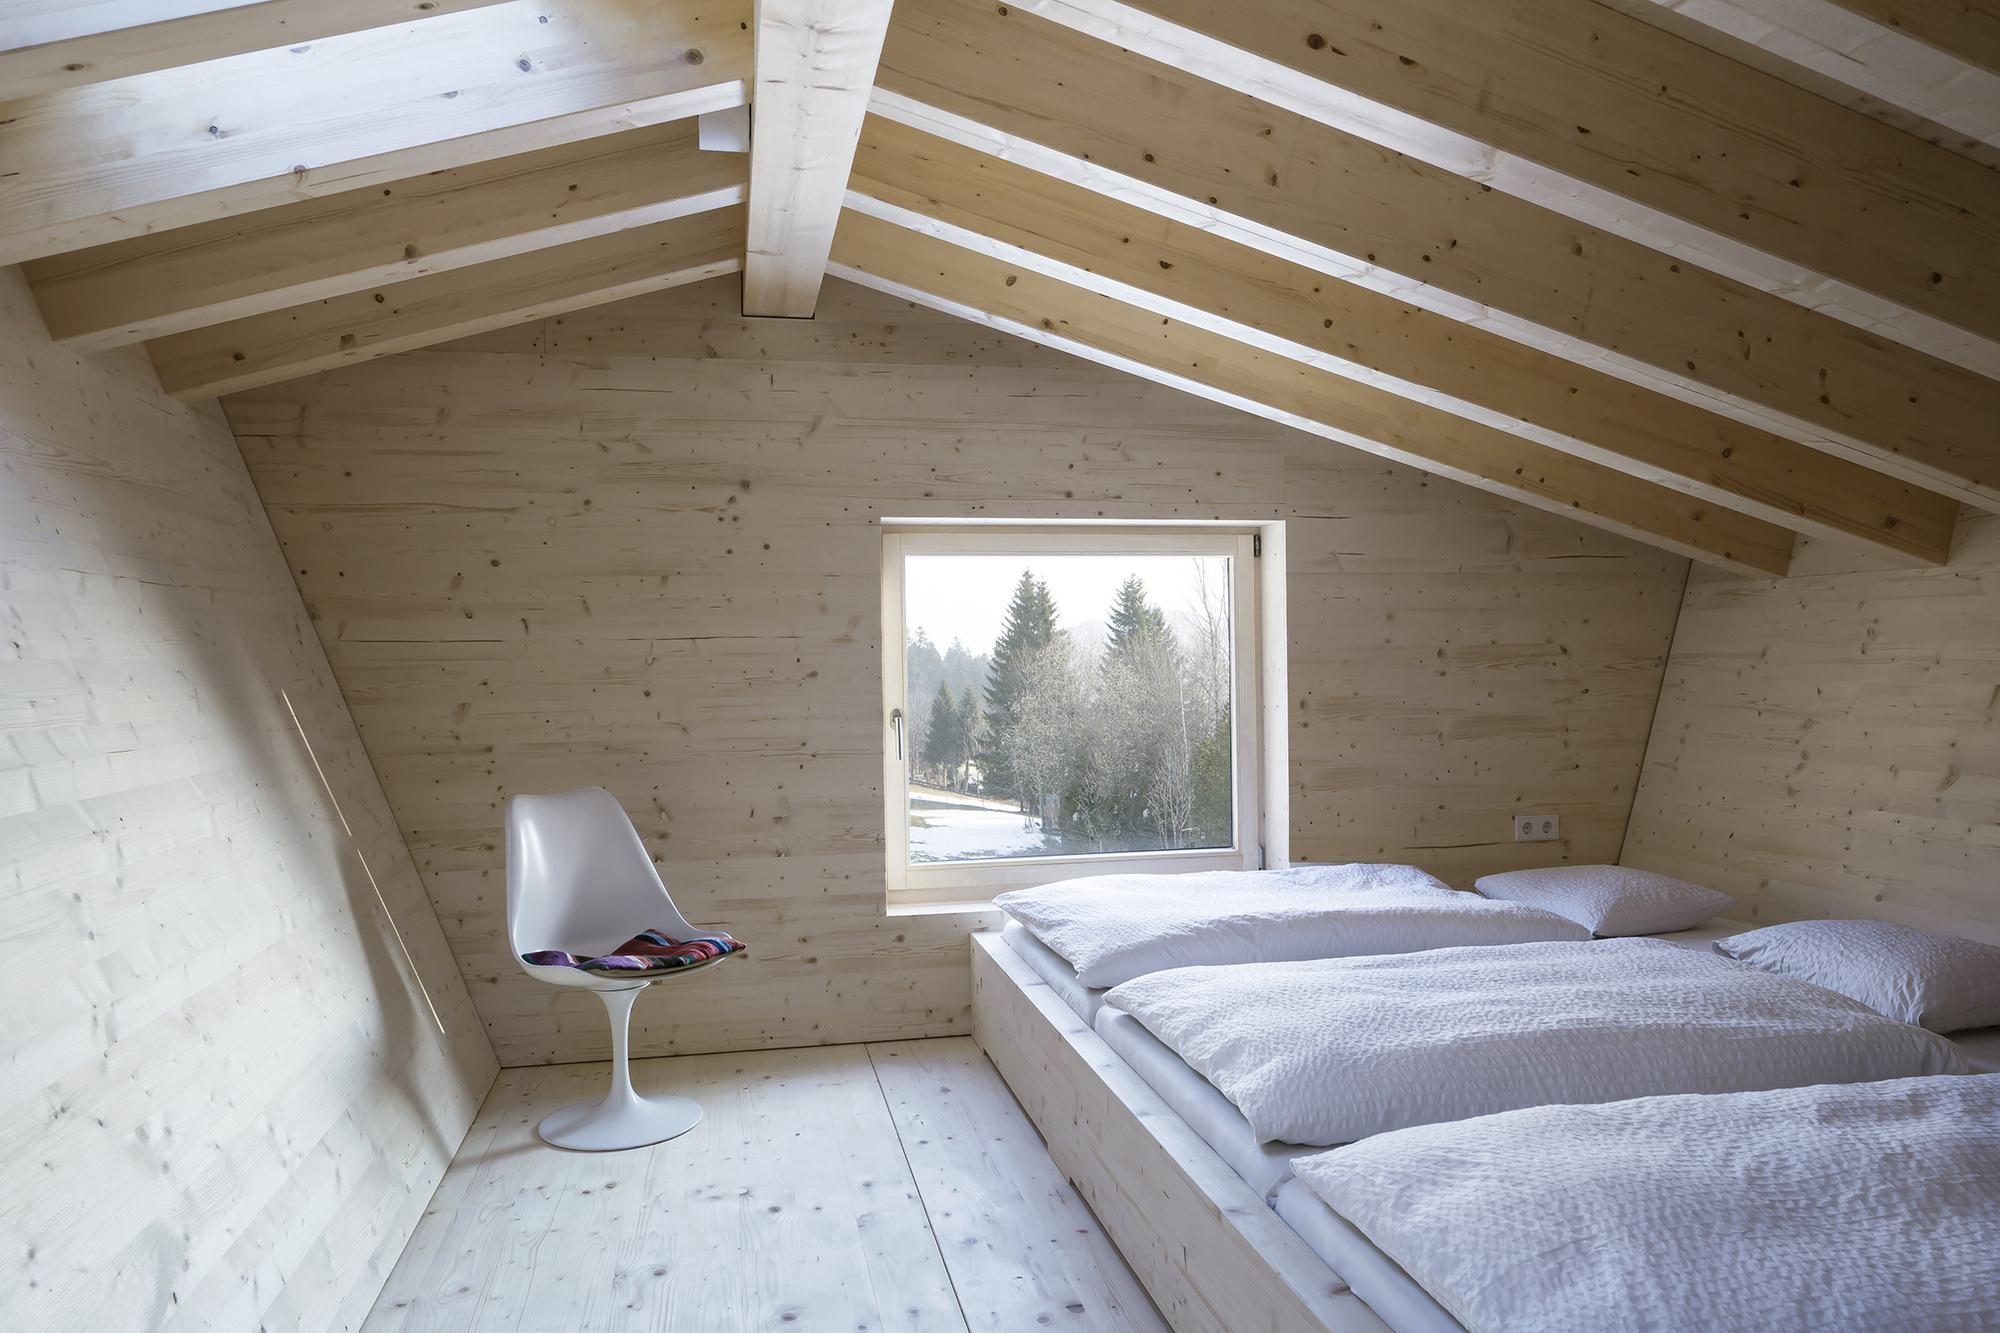 gallery of house p yonder architektur und design 23. Black Bedroom Furniture Sets. Home Design Ideas